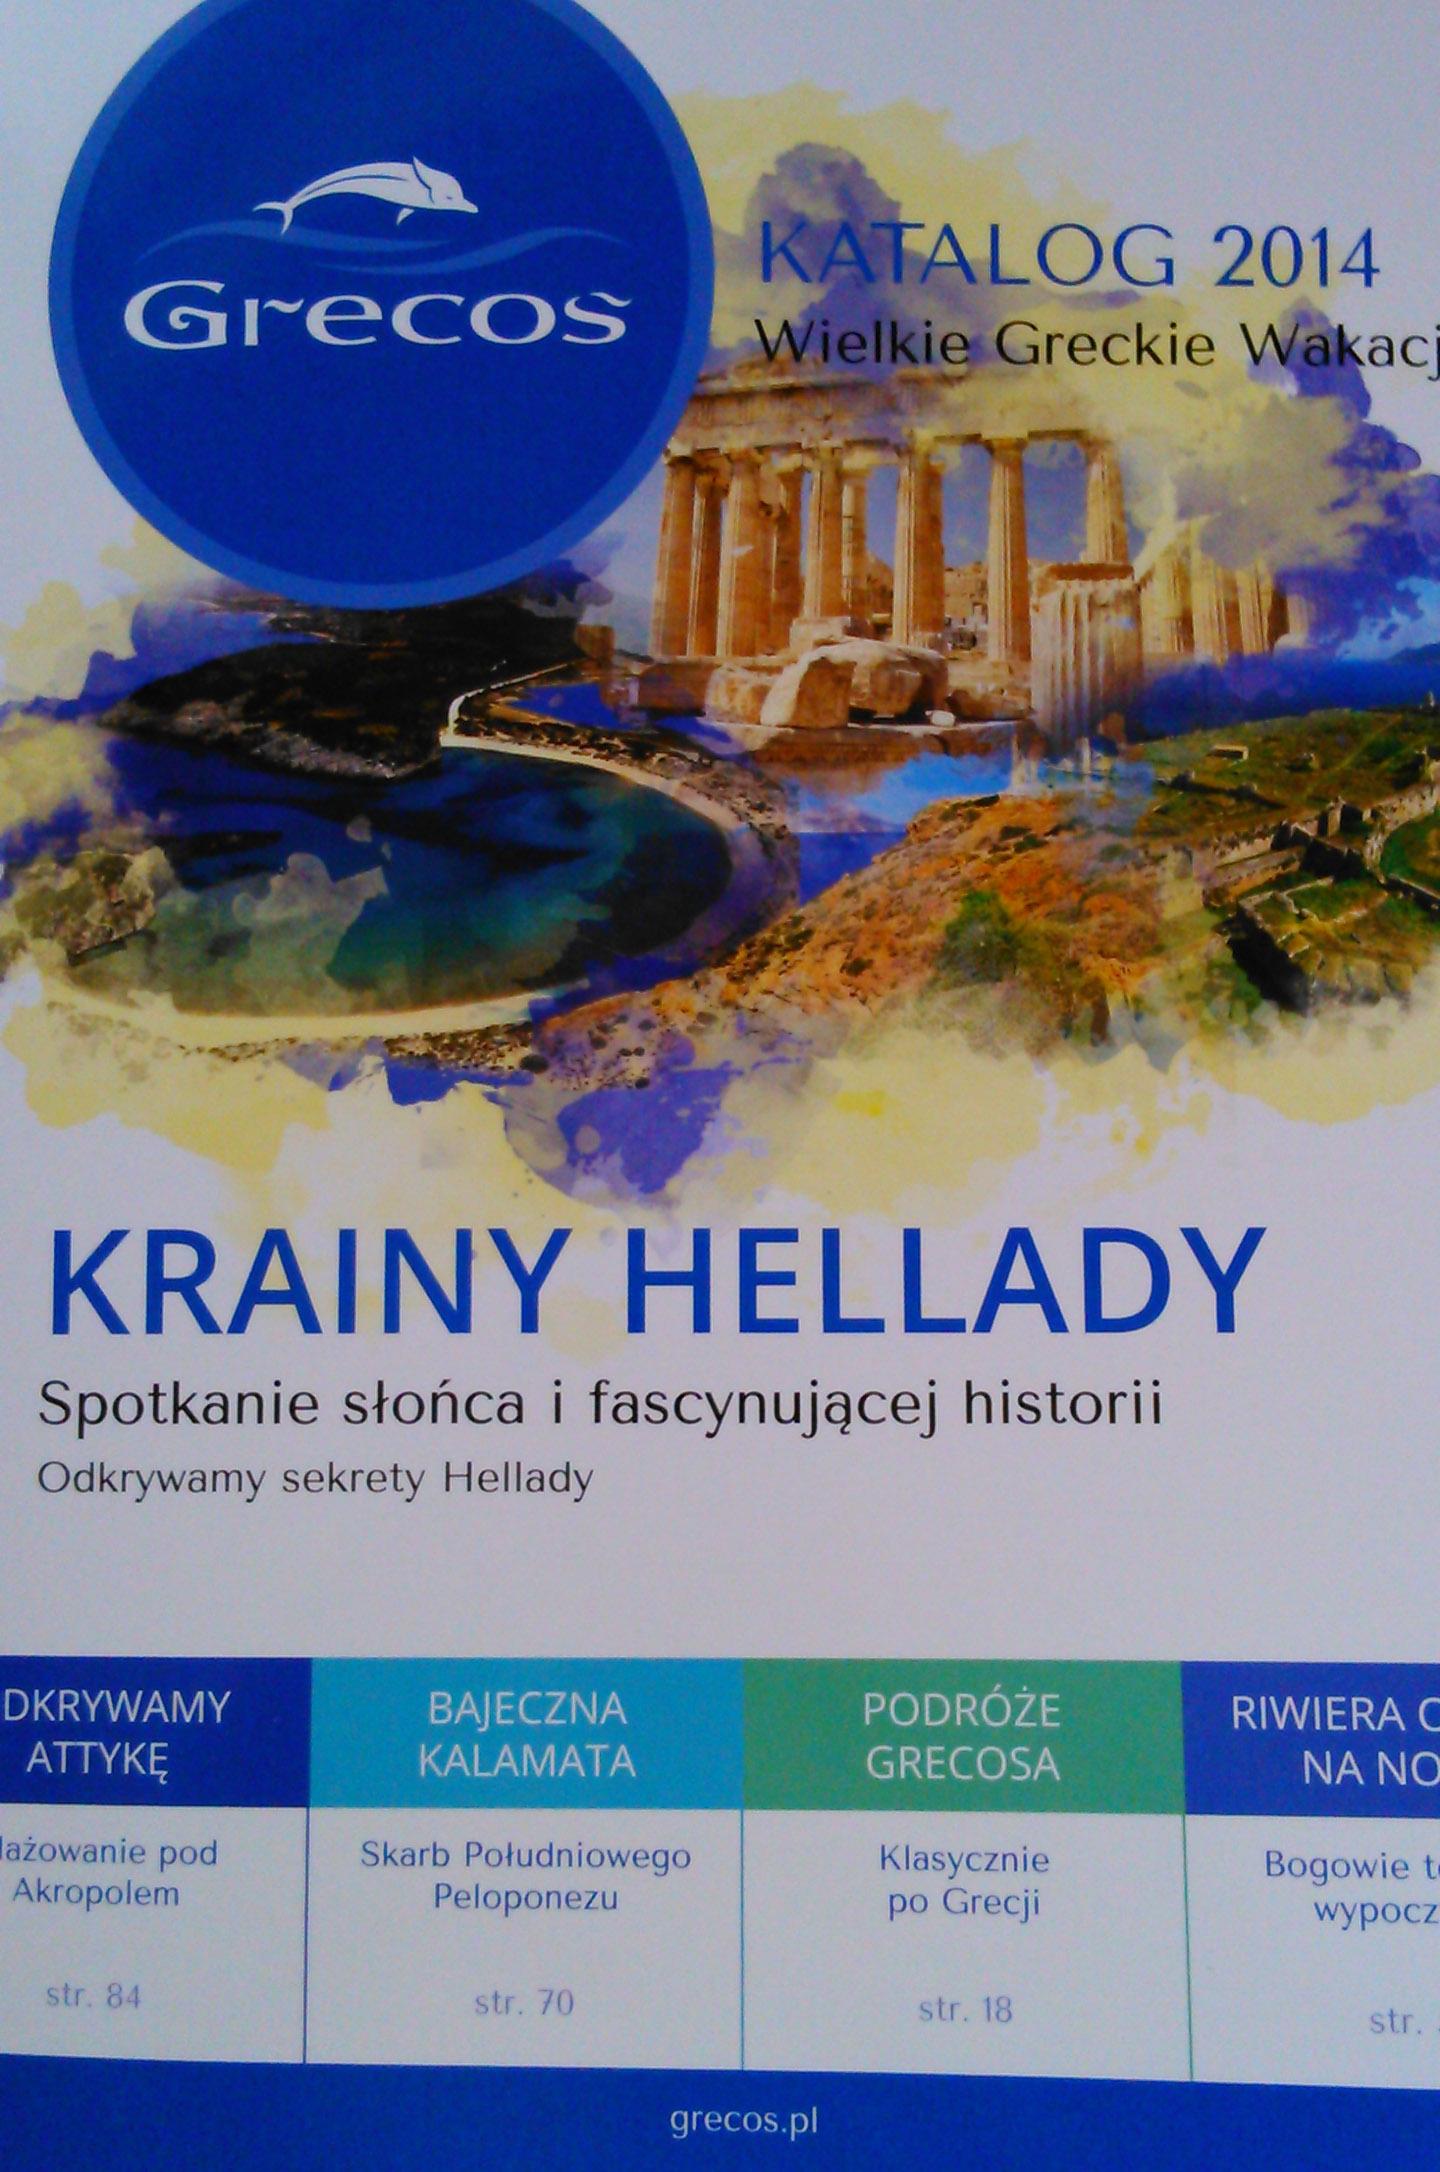 Grecos - katalog 2014